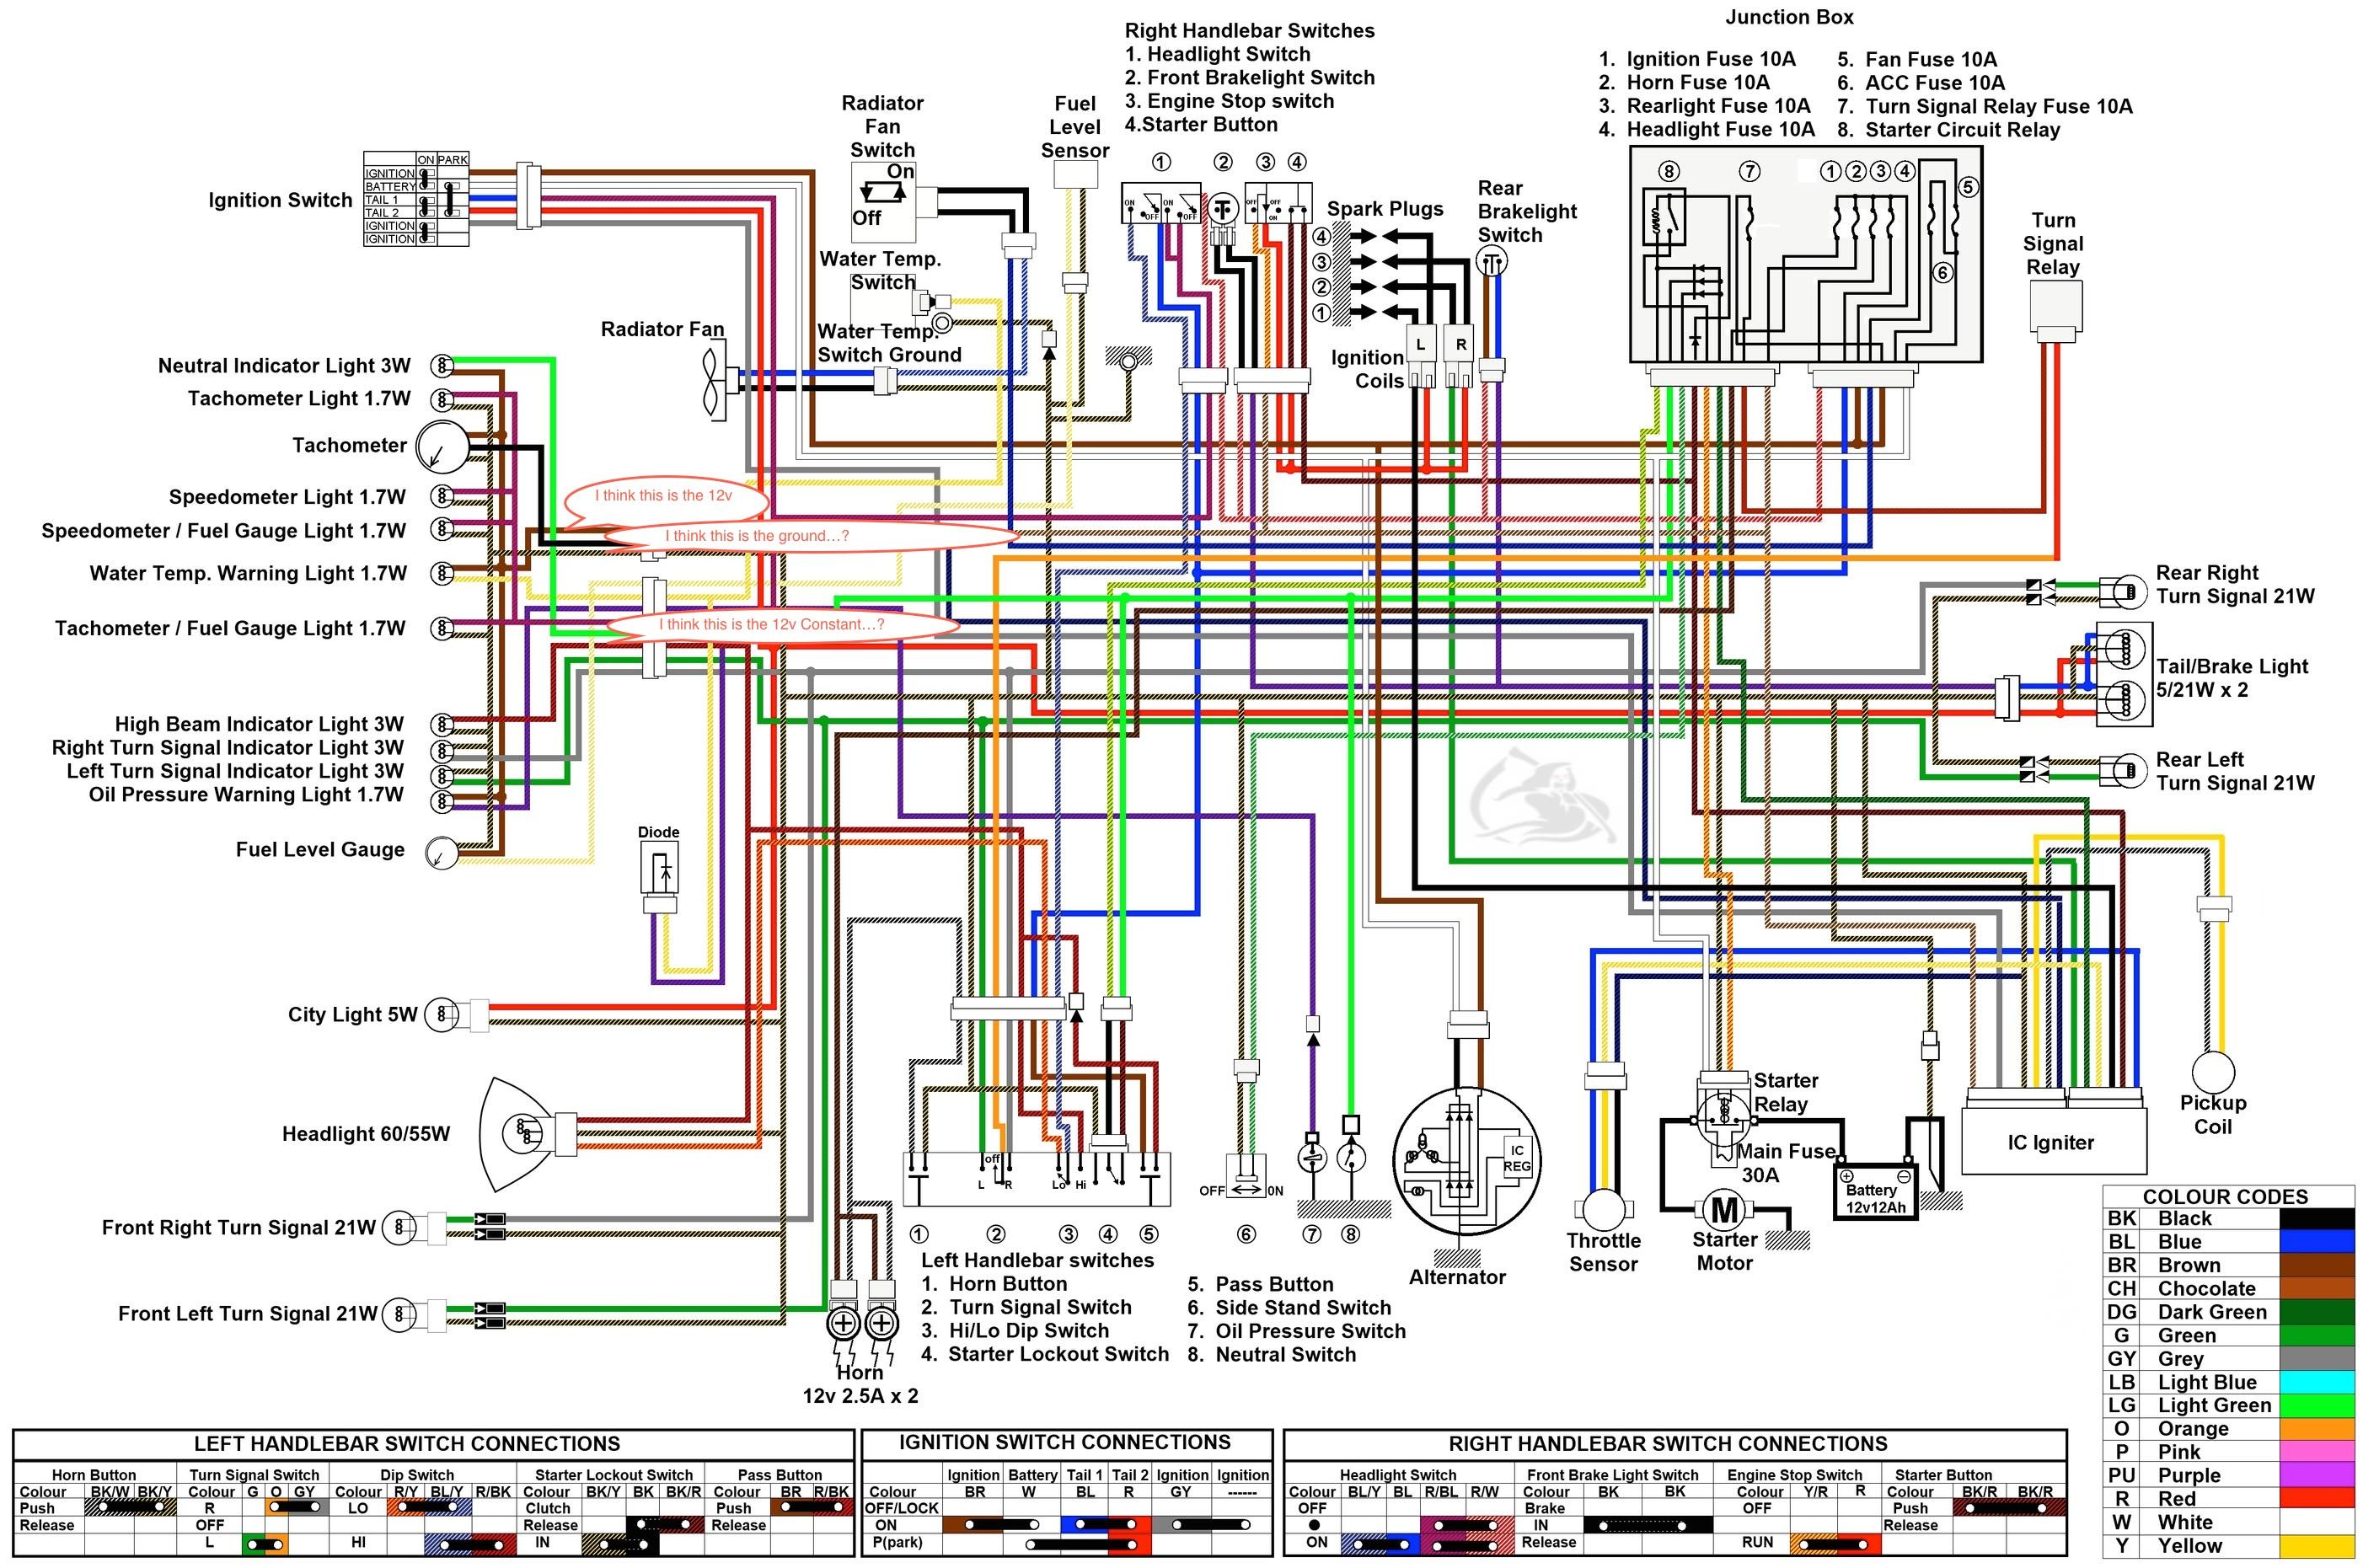 ex_3137] diagram furthermore motorcycle turn signal switch wiring diagram  schematic wiring  loskopri oxyl ittab olyti joami sand chim oxyl targ phae ariot verr vira  mohammedshrine librar wiring 101